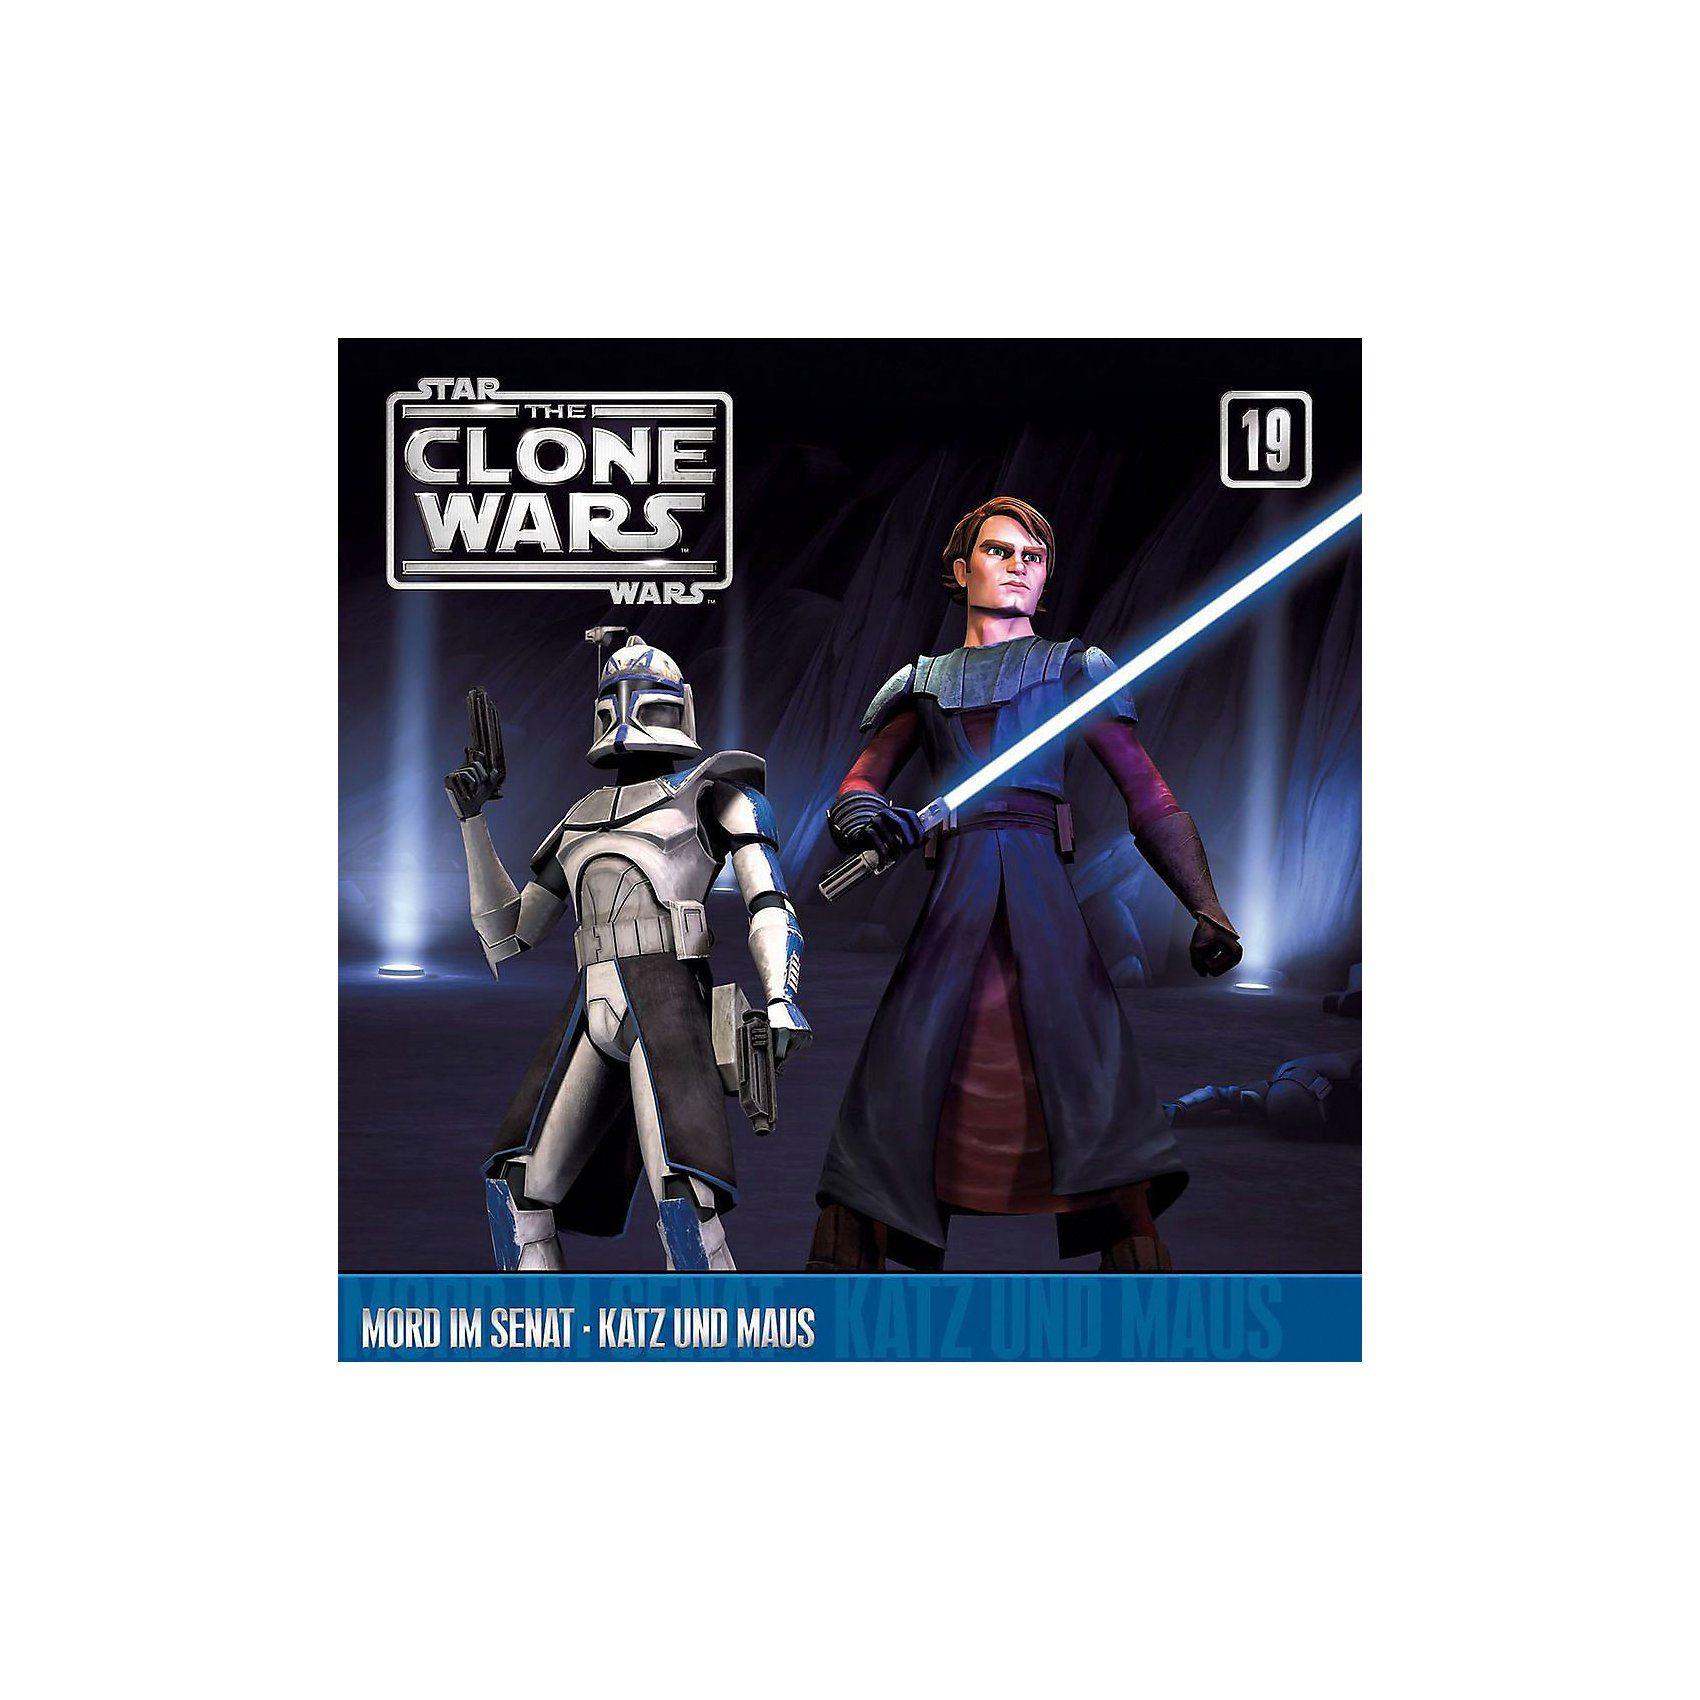 Universal CD The Clone Wars 19 - Mord im Senat / Katz und Maus